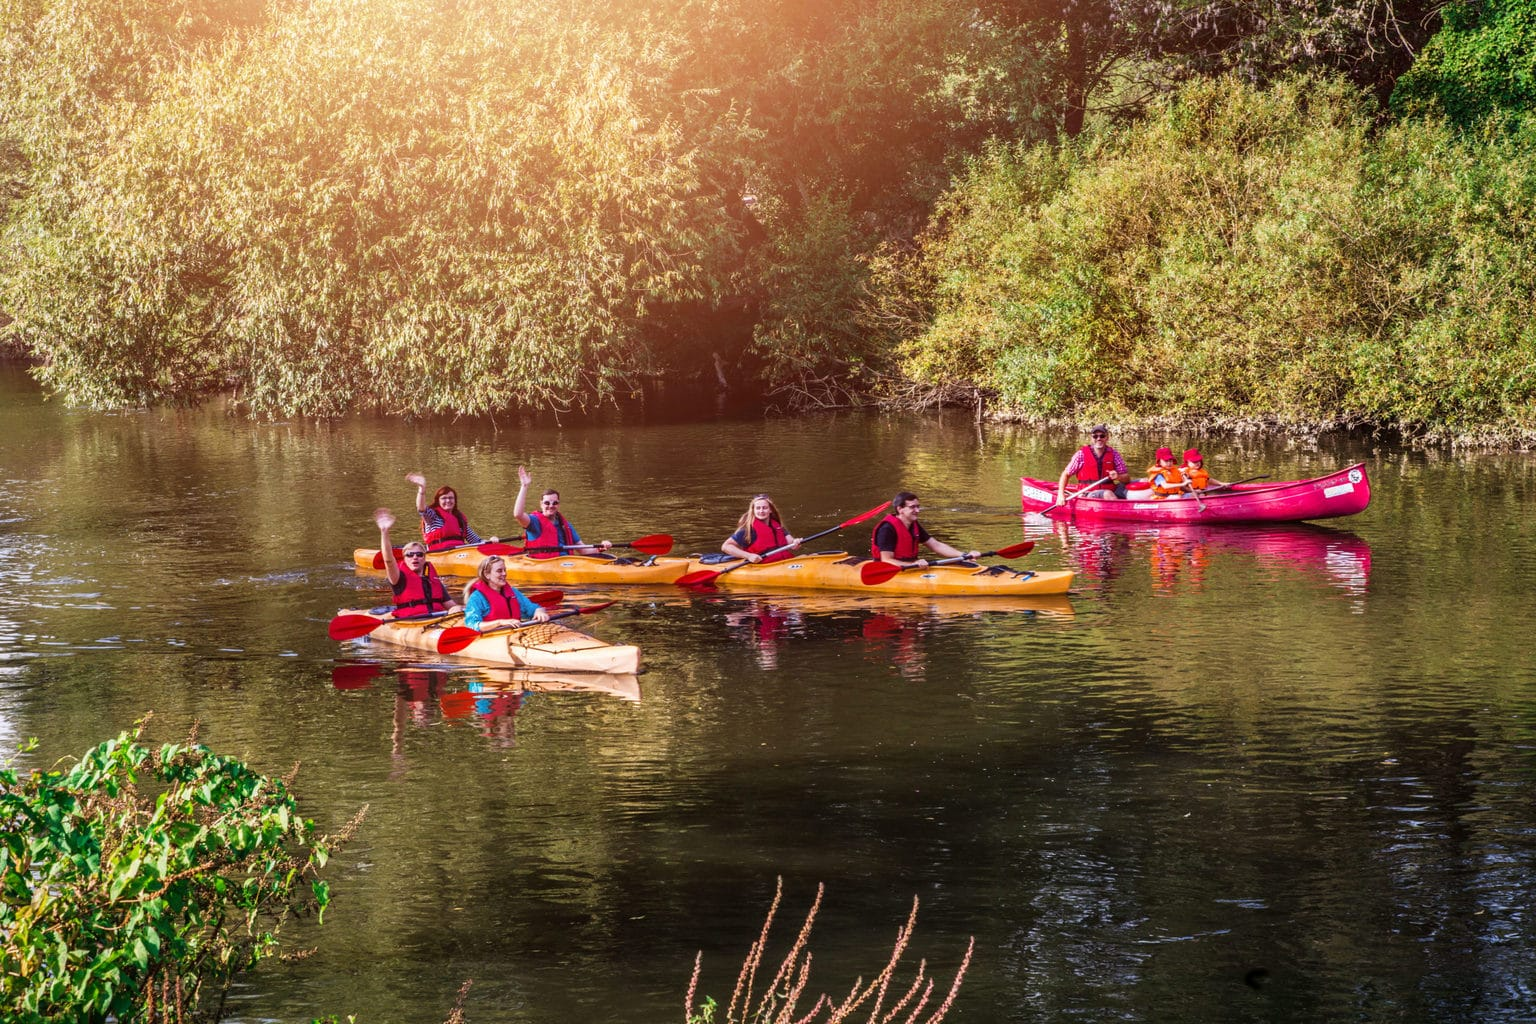 Kanoers op de rivier Unstrut